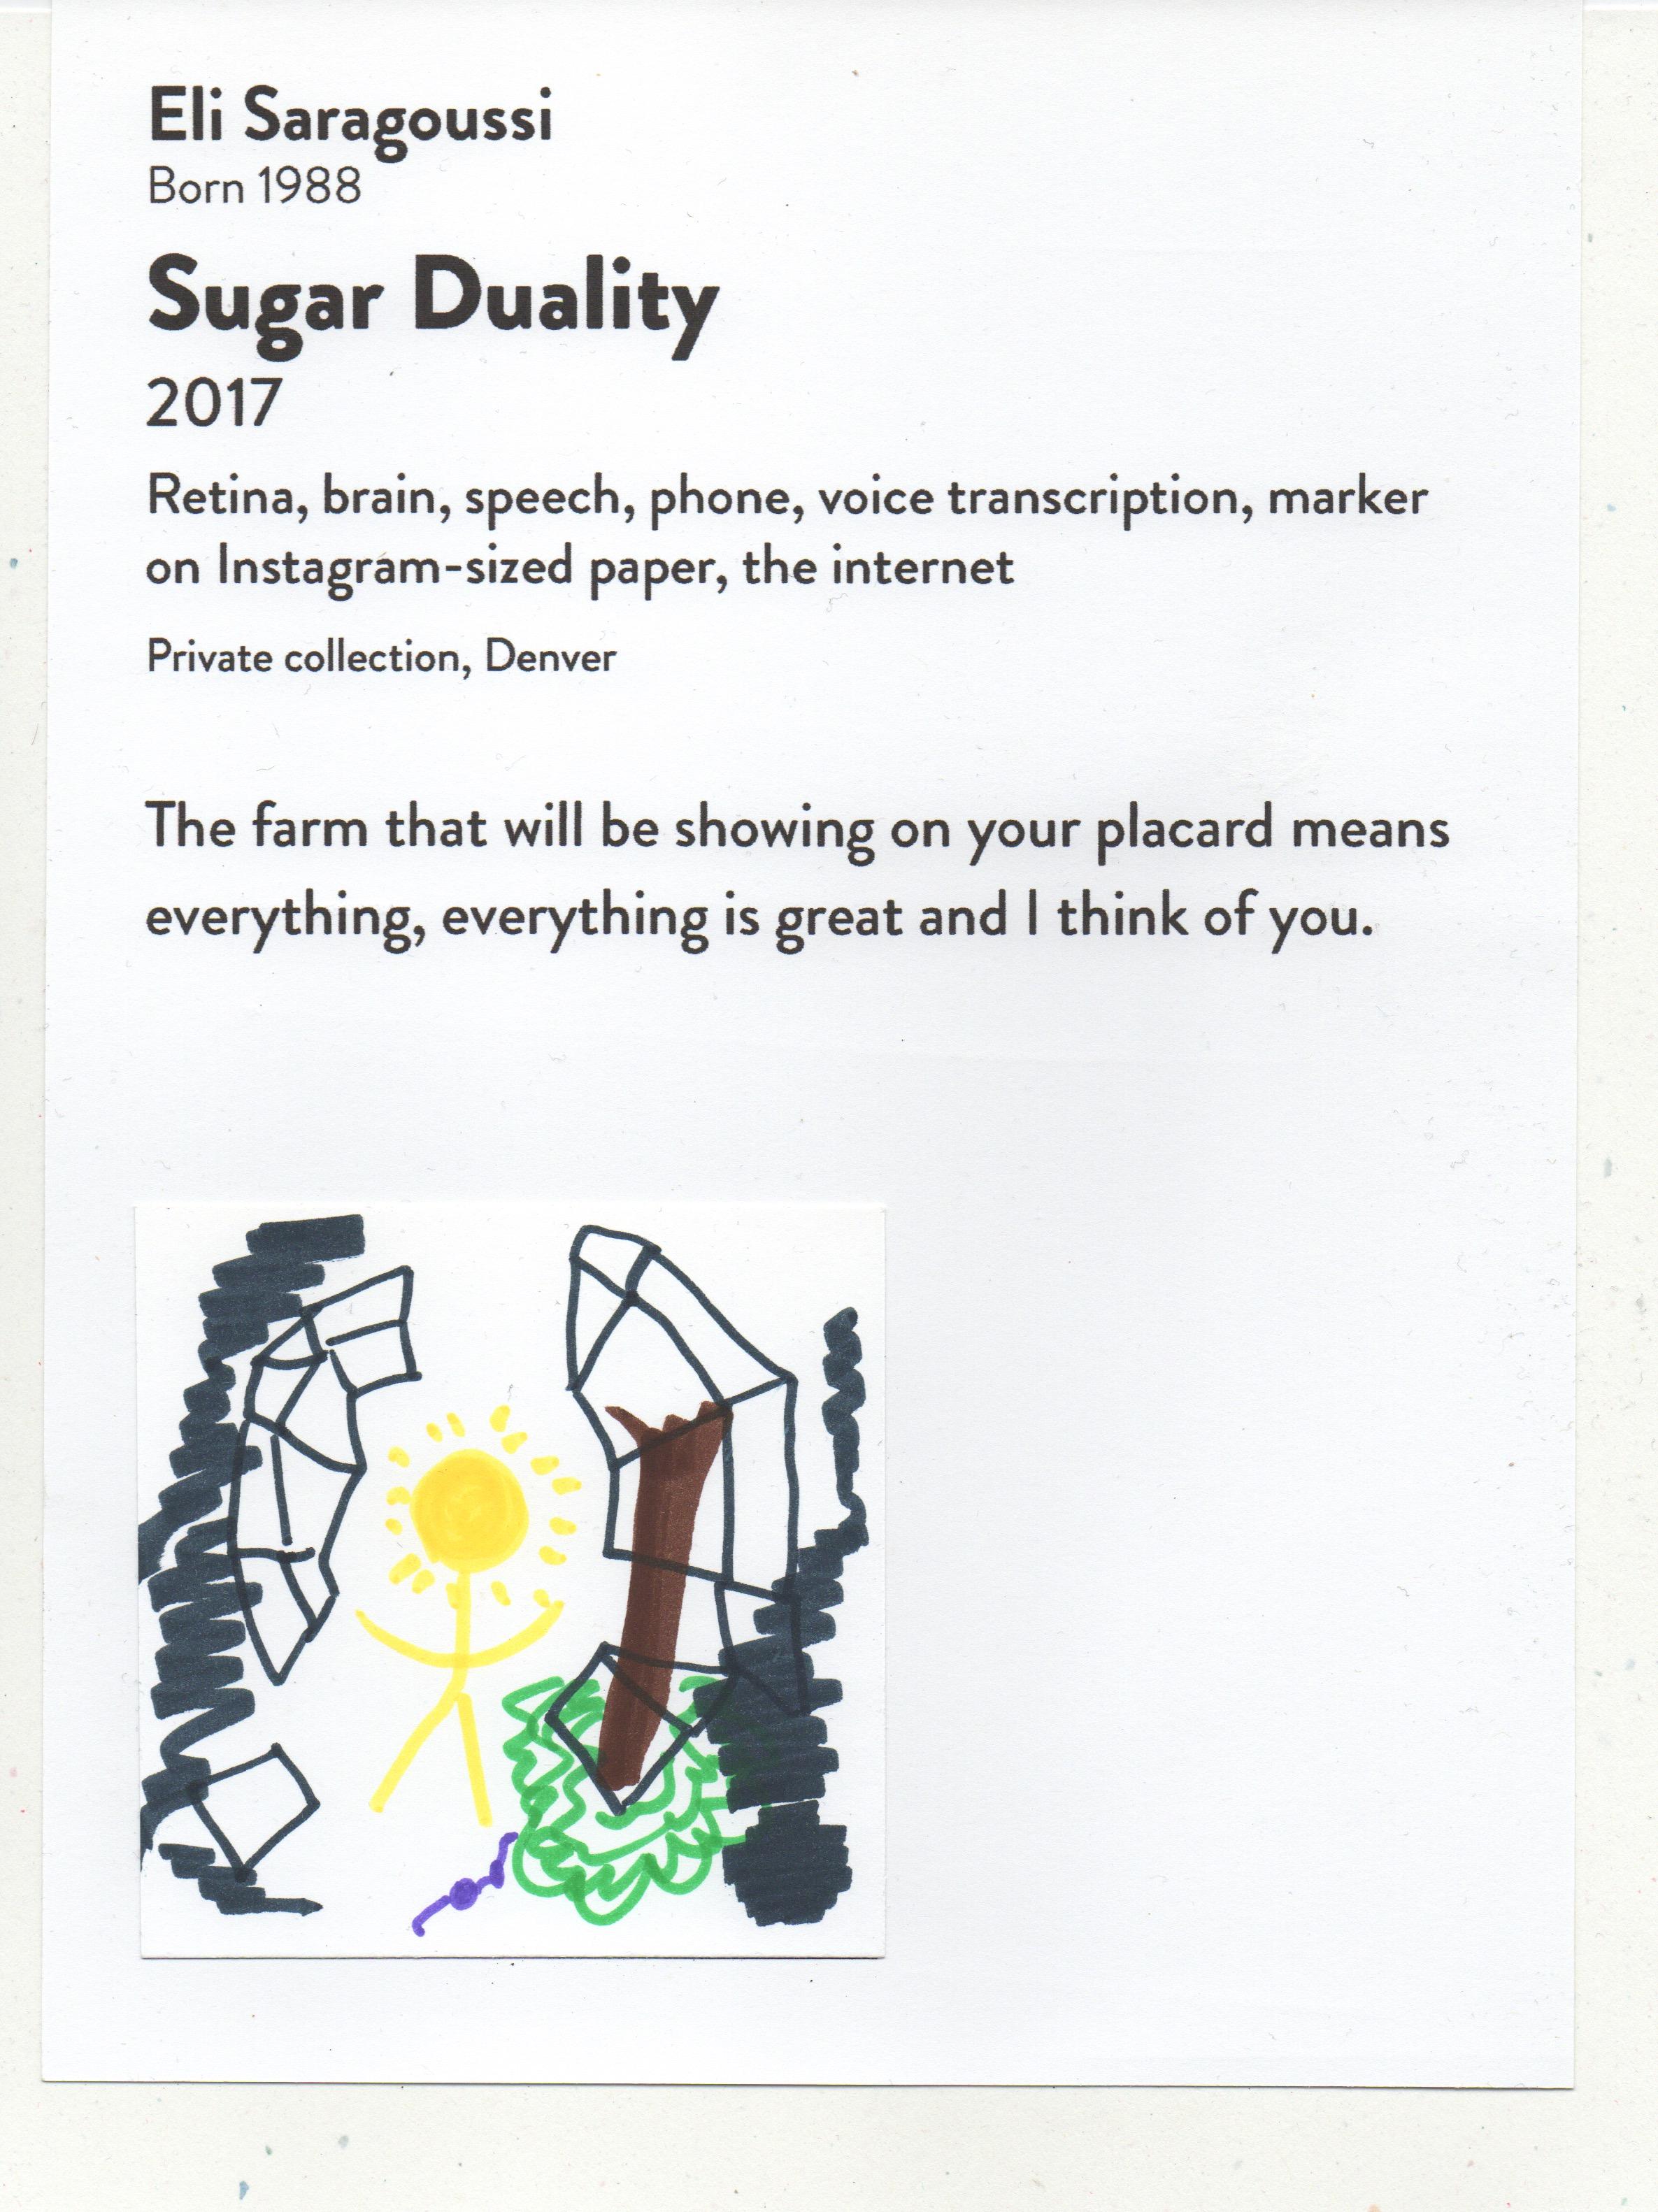 Sugar Duality DAM Untitled April 28, 2017.jpeg